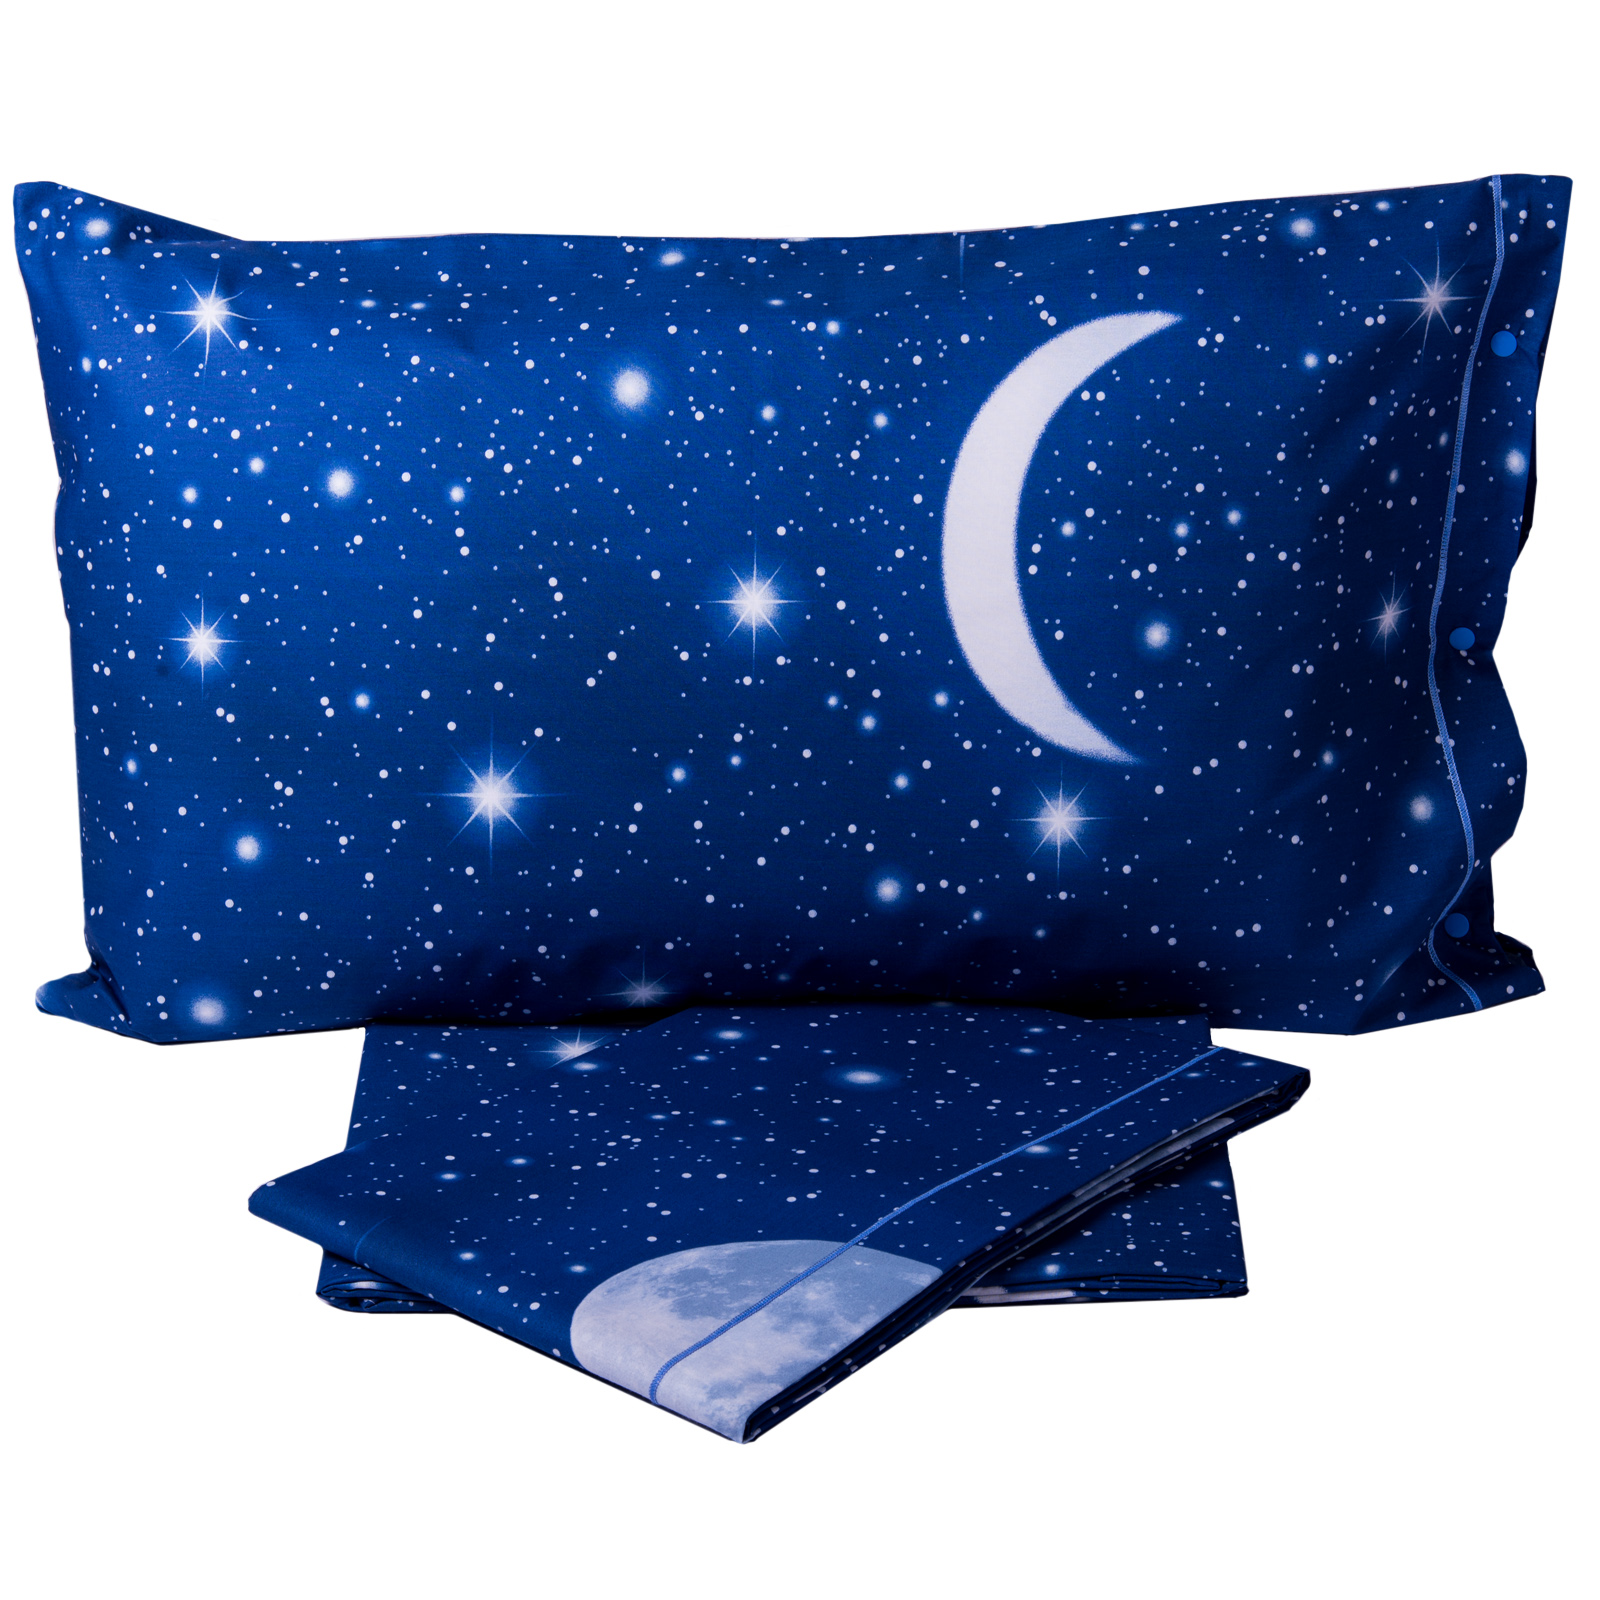 1aff467b58 Completo Copripiumino BASSETTI Sweet Moon Si Illumina al Buio - Cose ...